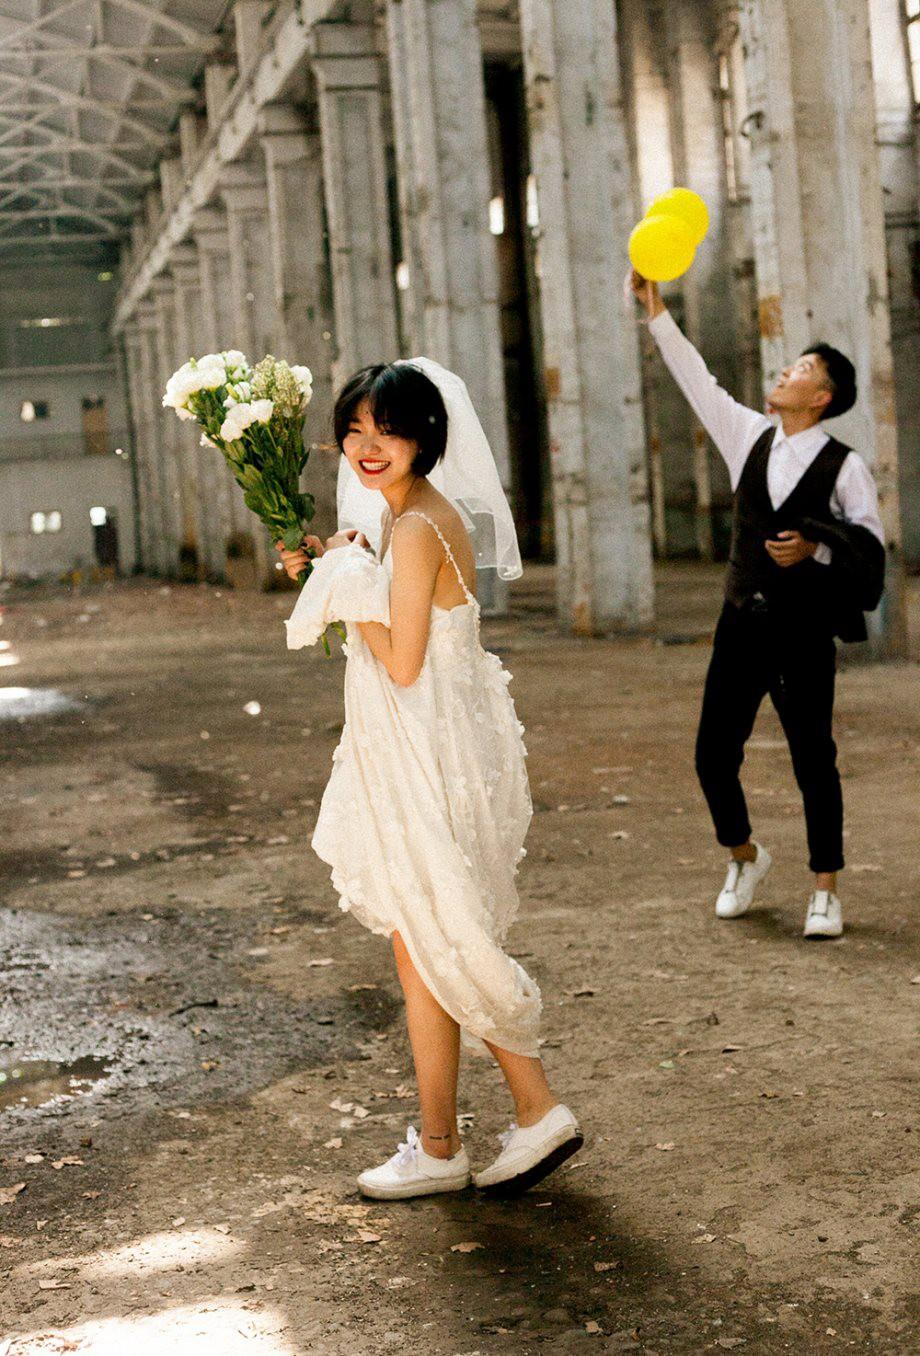 ... Bộ ảnh cưới m\u0026#249;a h\u0026#232; của c\u0026#244